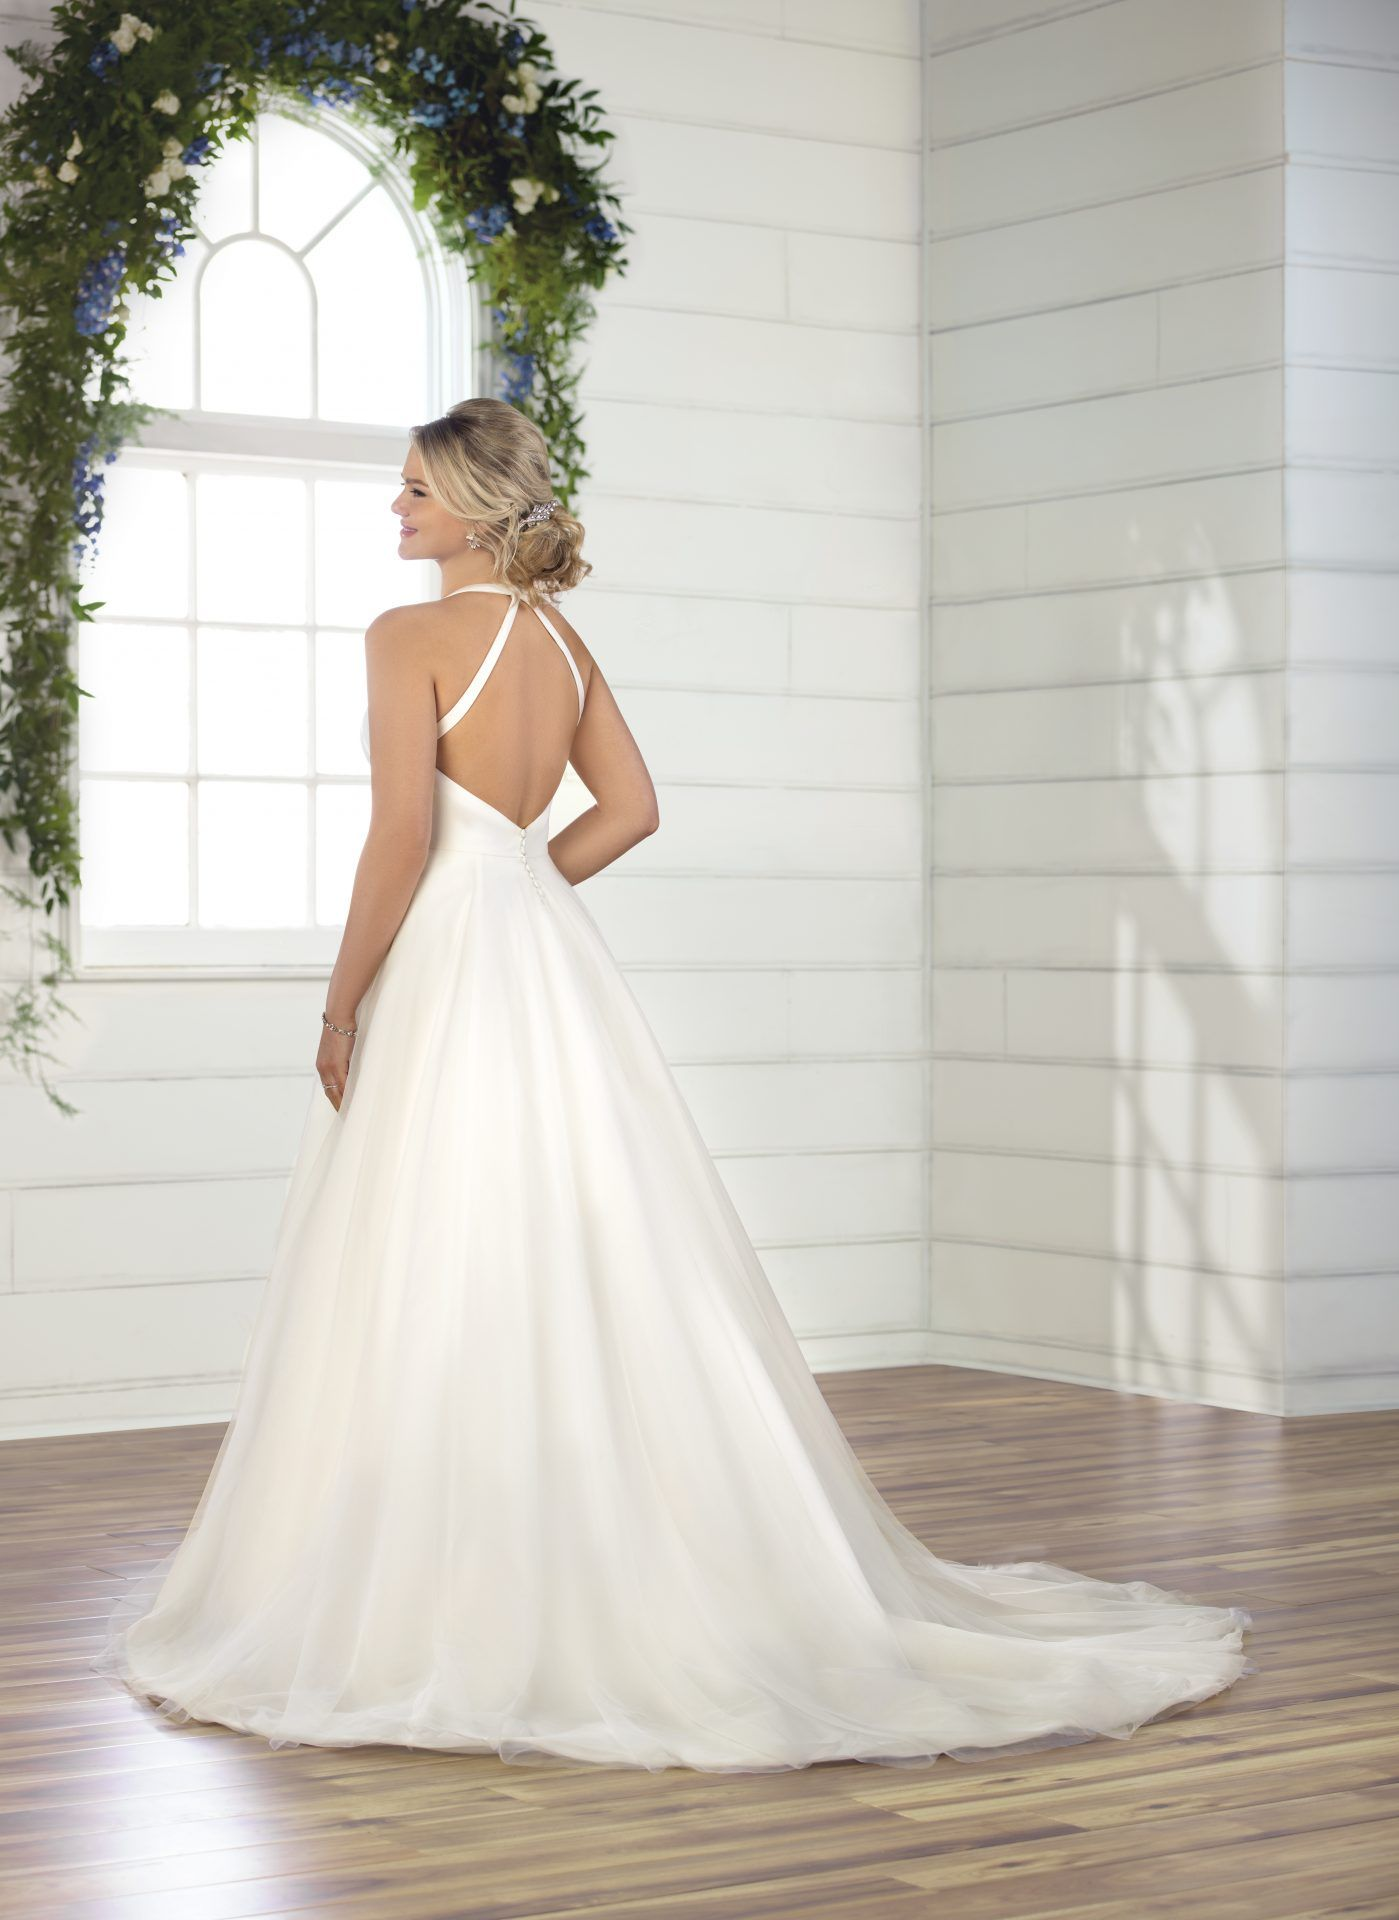 Essense Of Australia In 2020 Essense Of Australia Wedding Dresses Ball Gowns Wedding Wedding Dresses,Confederate Flag Wedding Dress